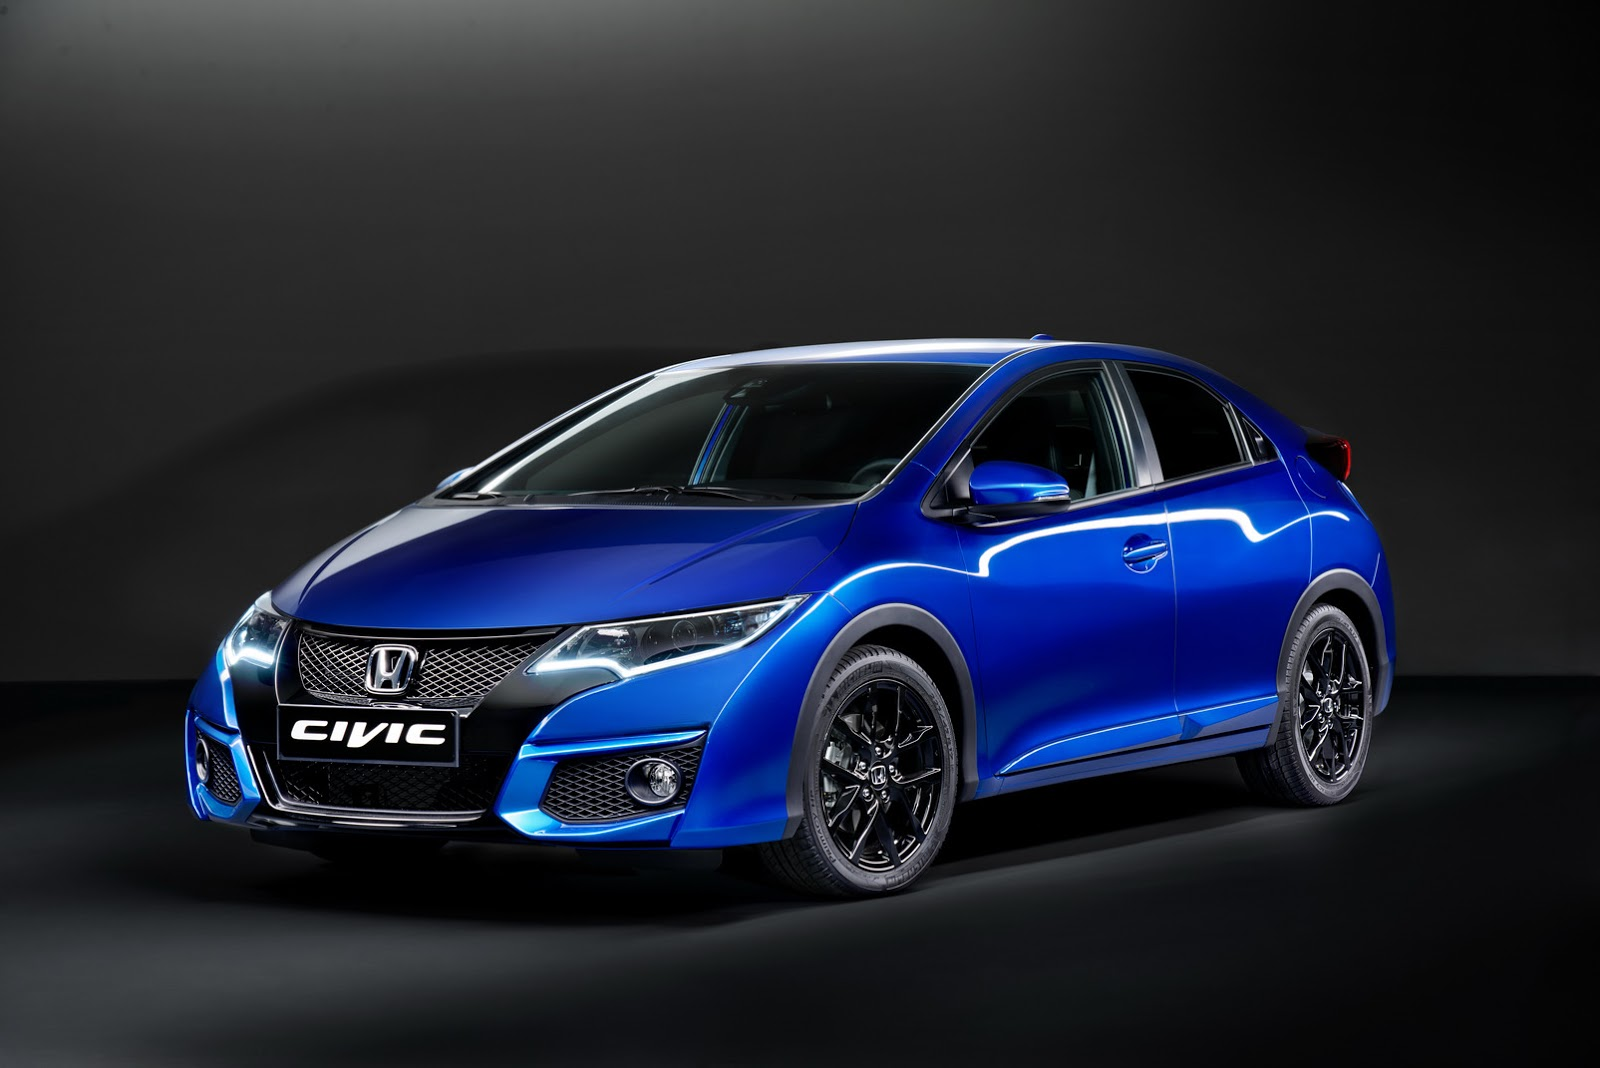 2015 Honda Civic Facelift Unveiled, Including New Sport Model - autoevolution